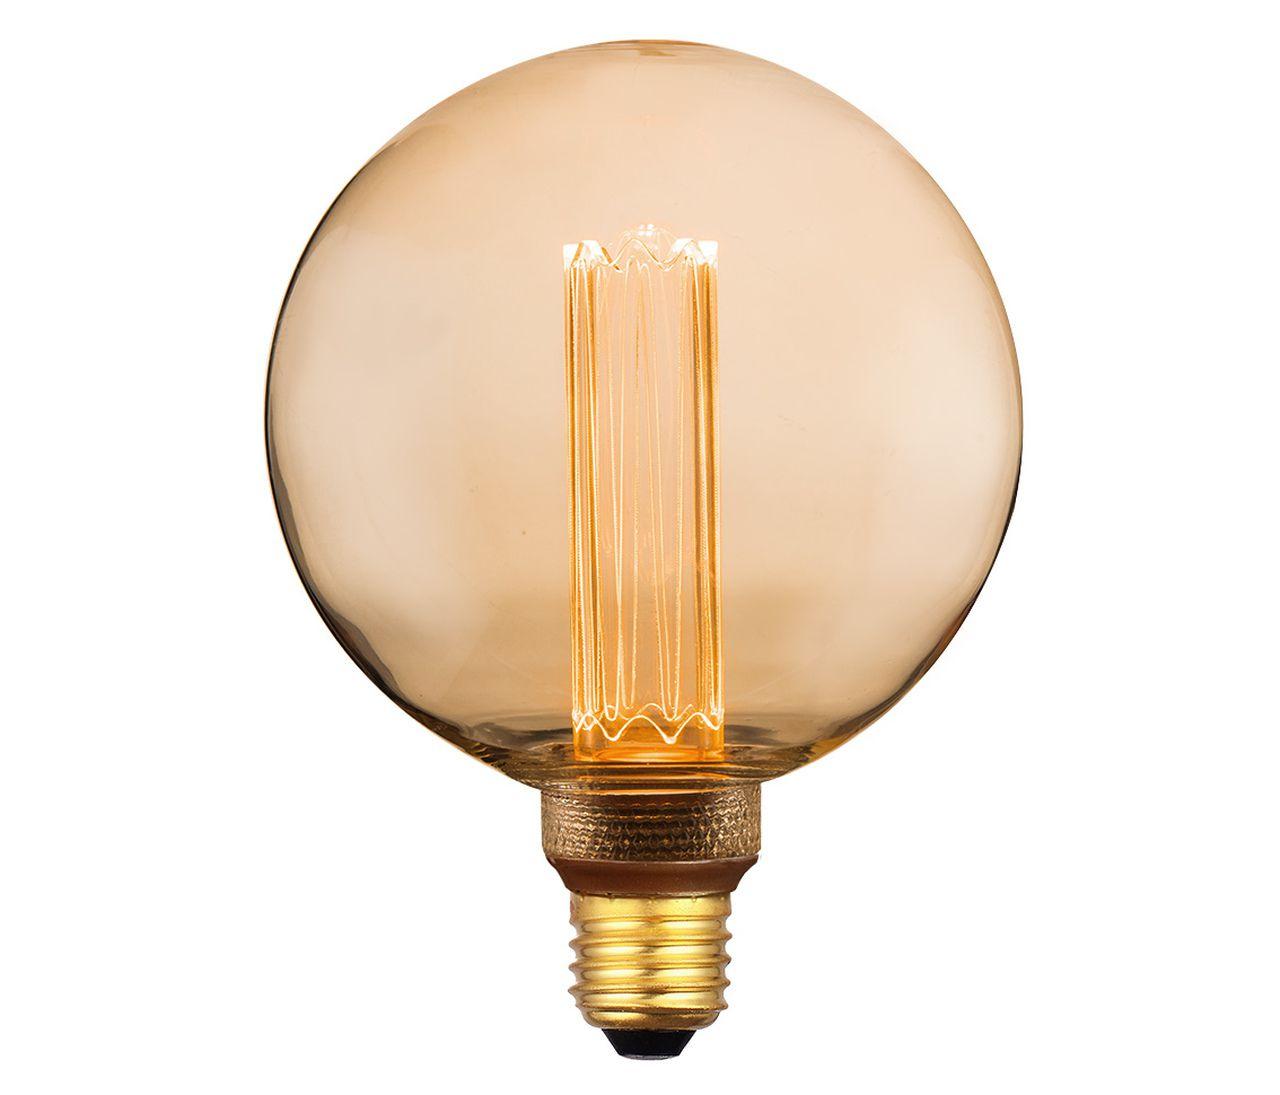 LÂMPADA DECORATIVA LED G125 2.5 W BRANCO QUENTE BIVOLT